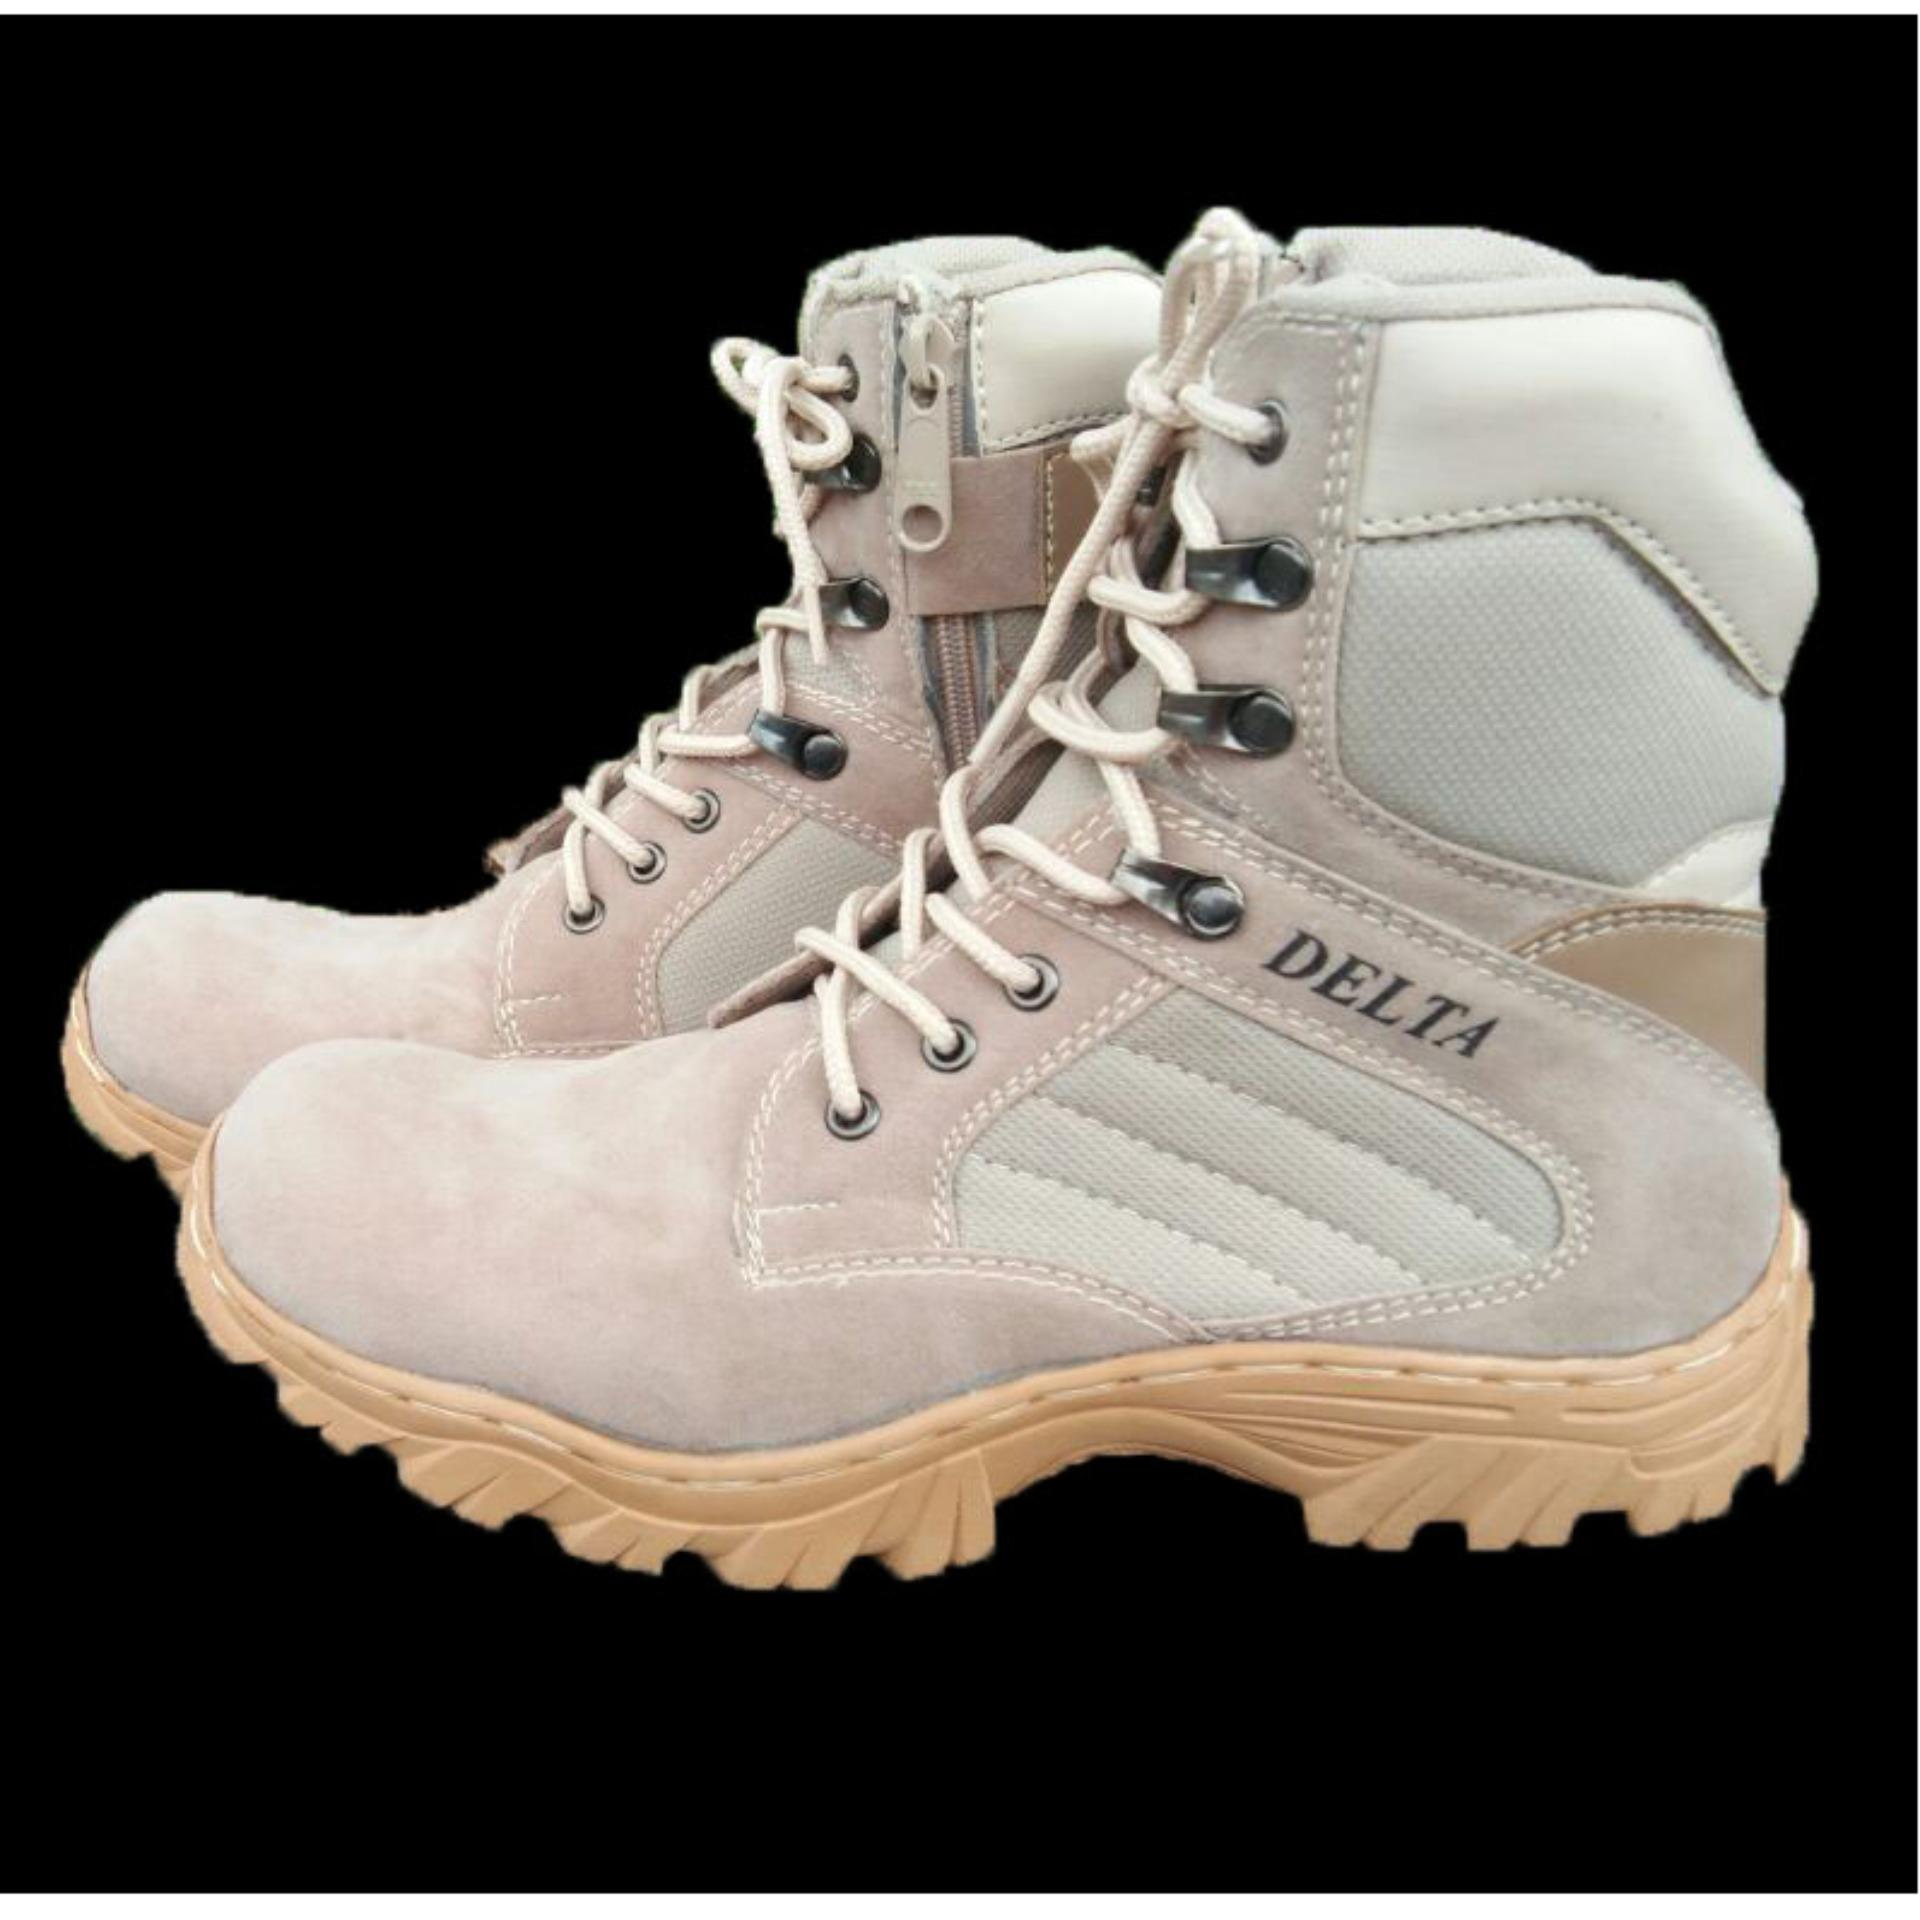 Sepatu Boot Hiking Delta High 8inch Kualitas Outdoor - Gurun